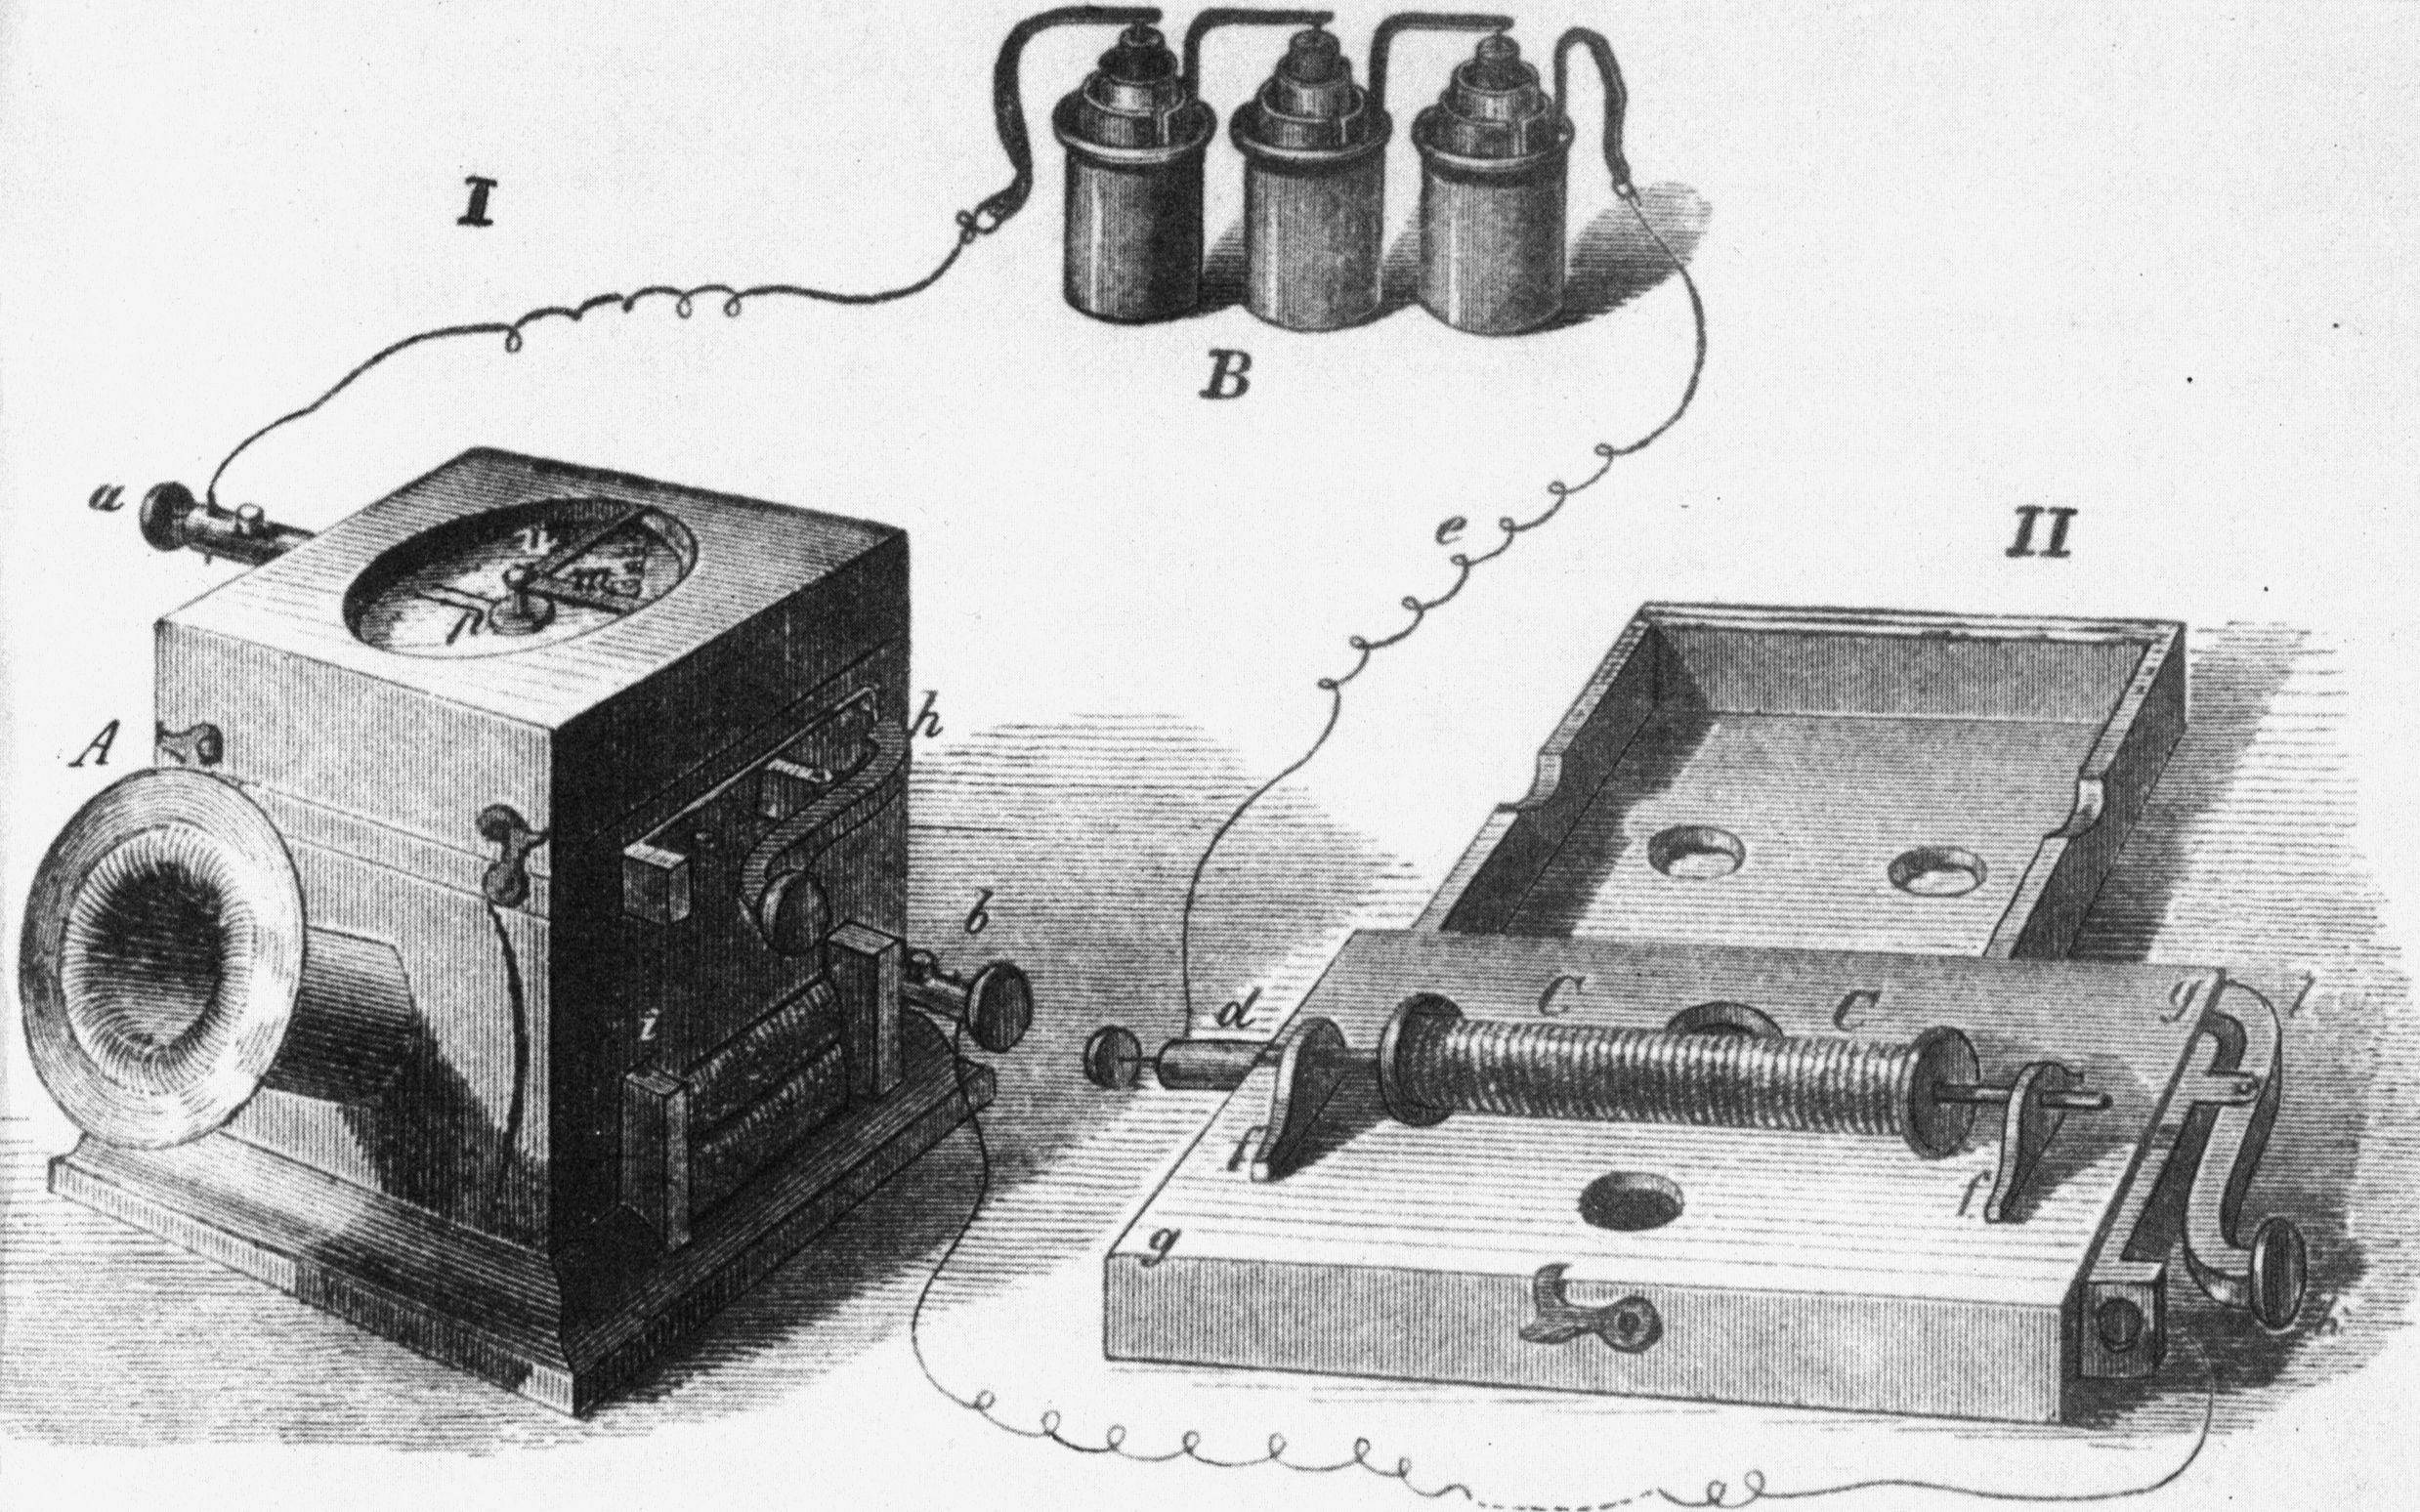 http://upload.wikimedia.org/wikipedia/commons/3/38/Johann_Philipp_Reis_telephone.jpg